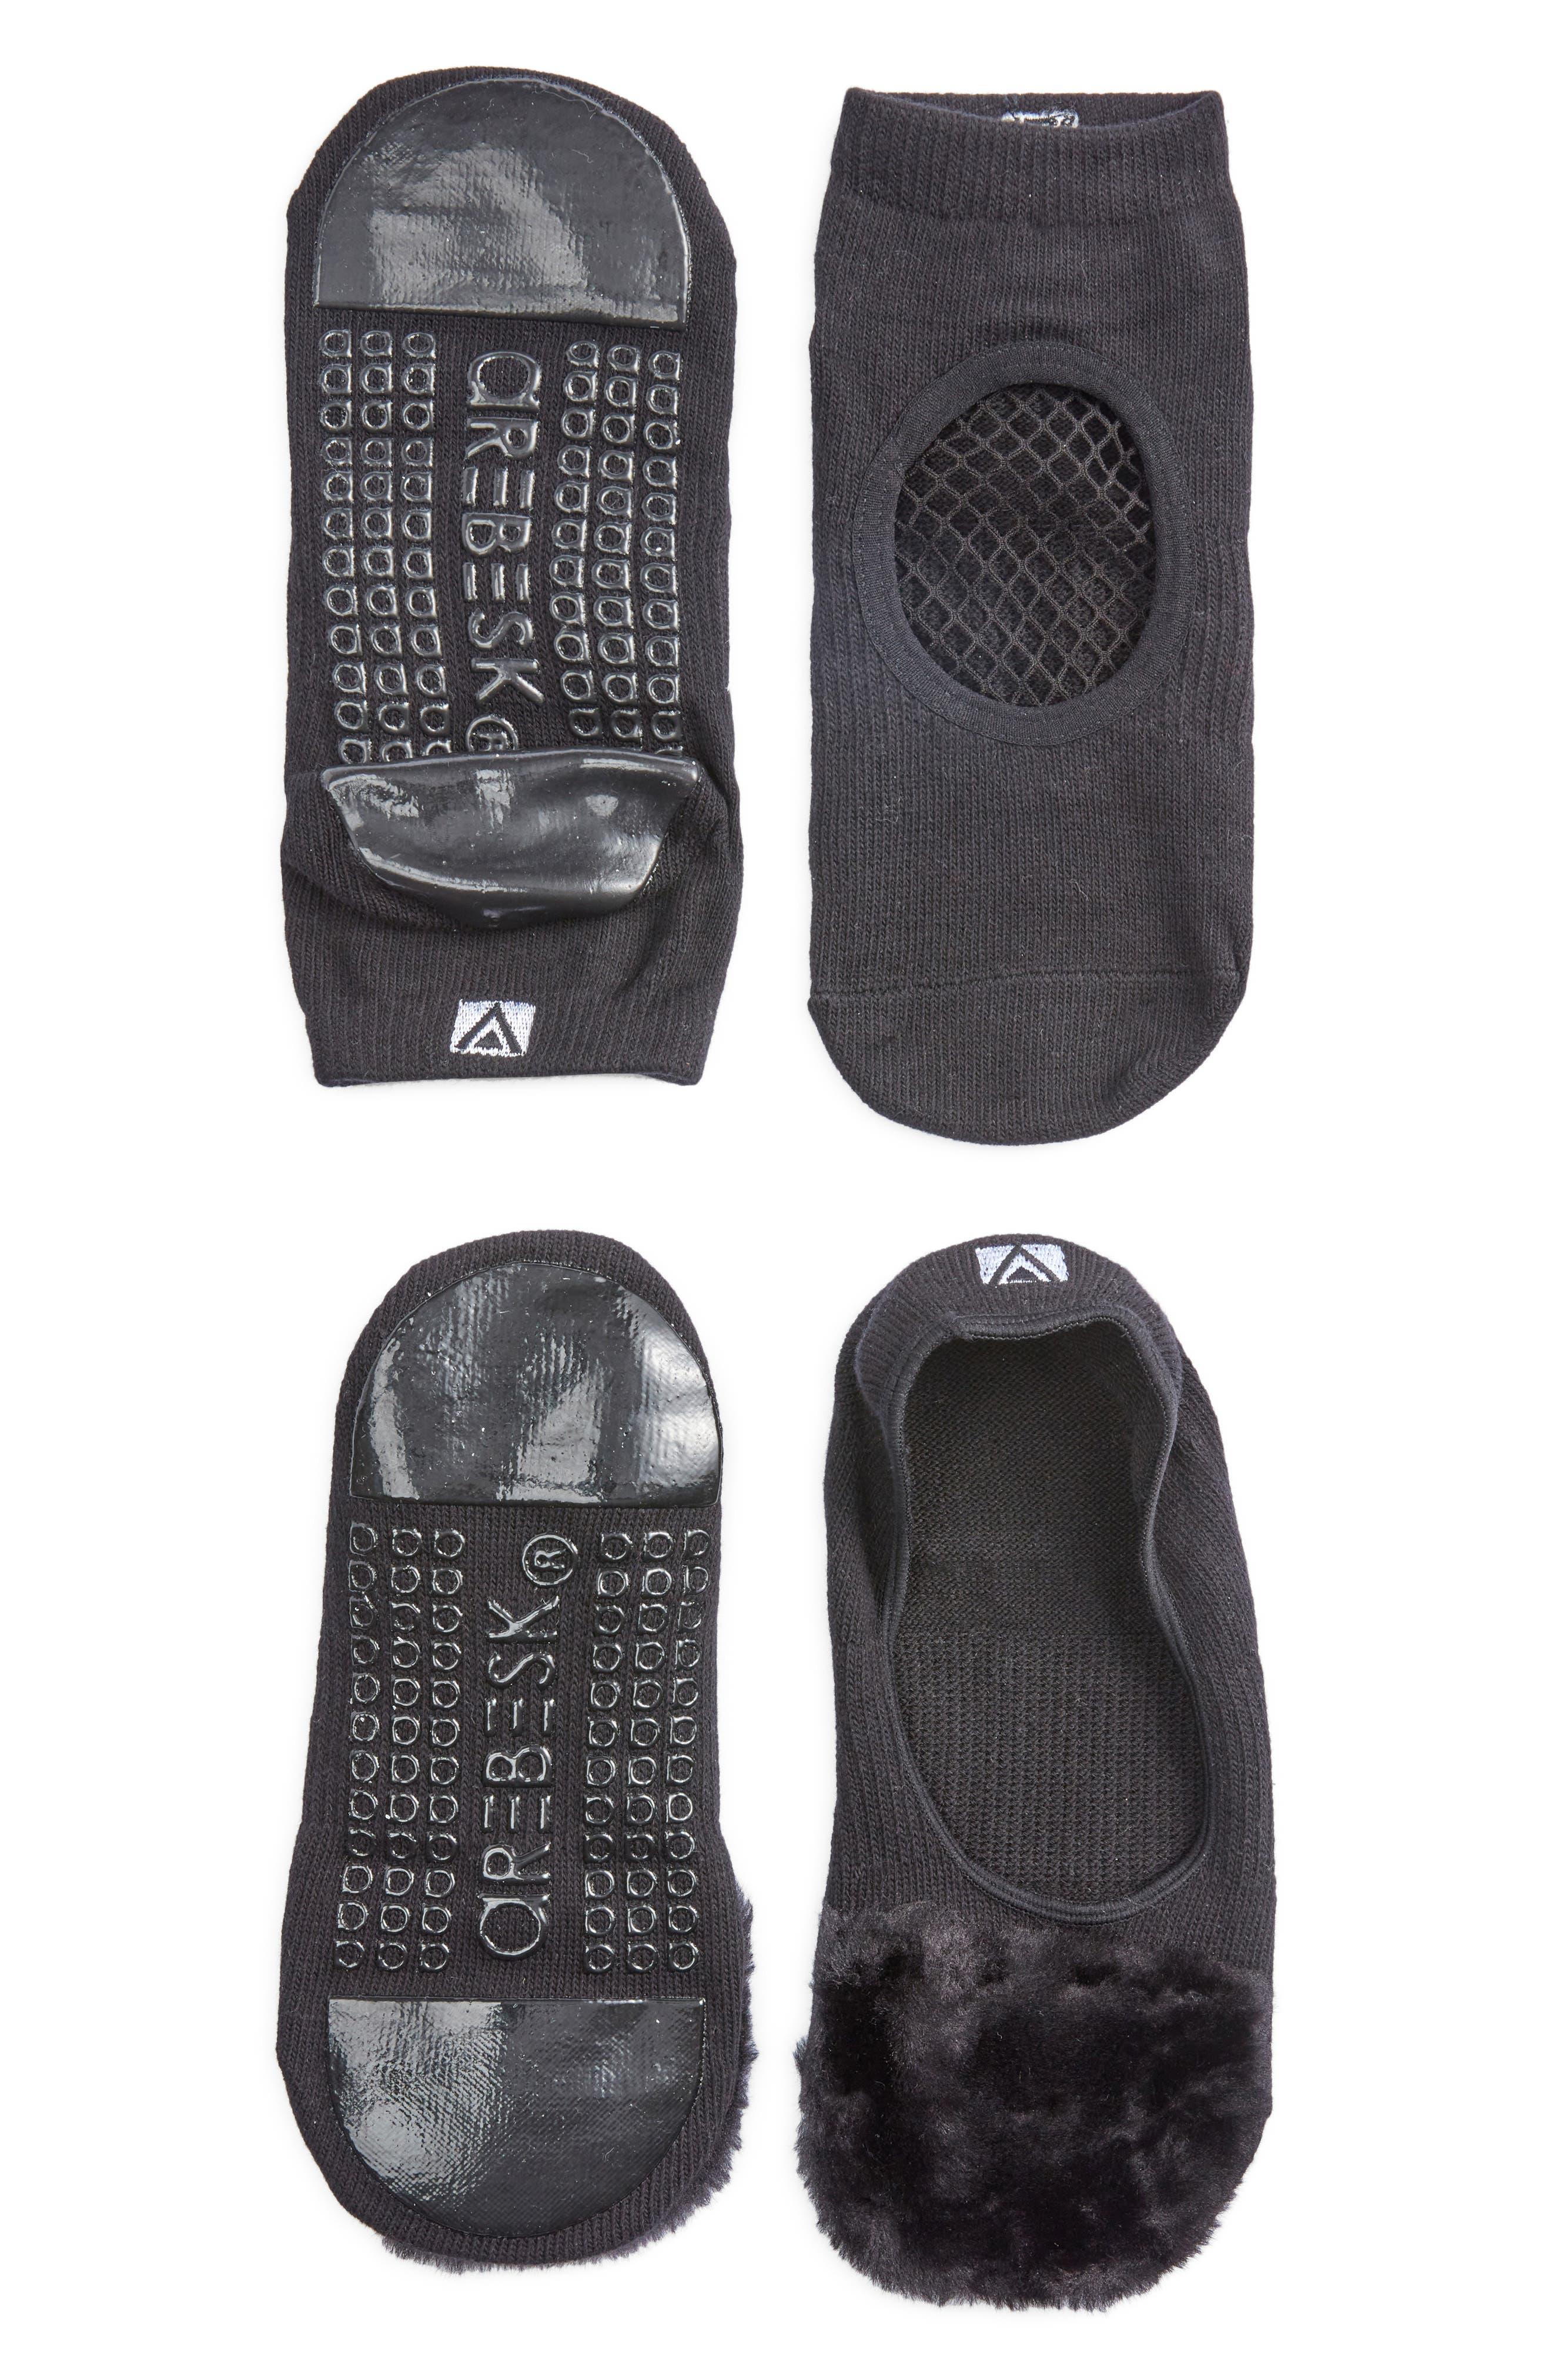 Phish Net Assorted 2-Pack Closed Toe Ankle Socks